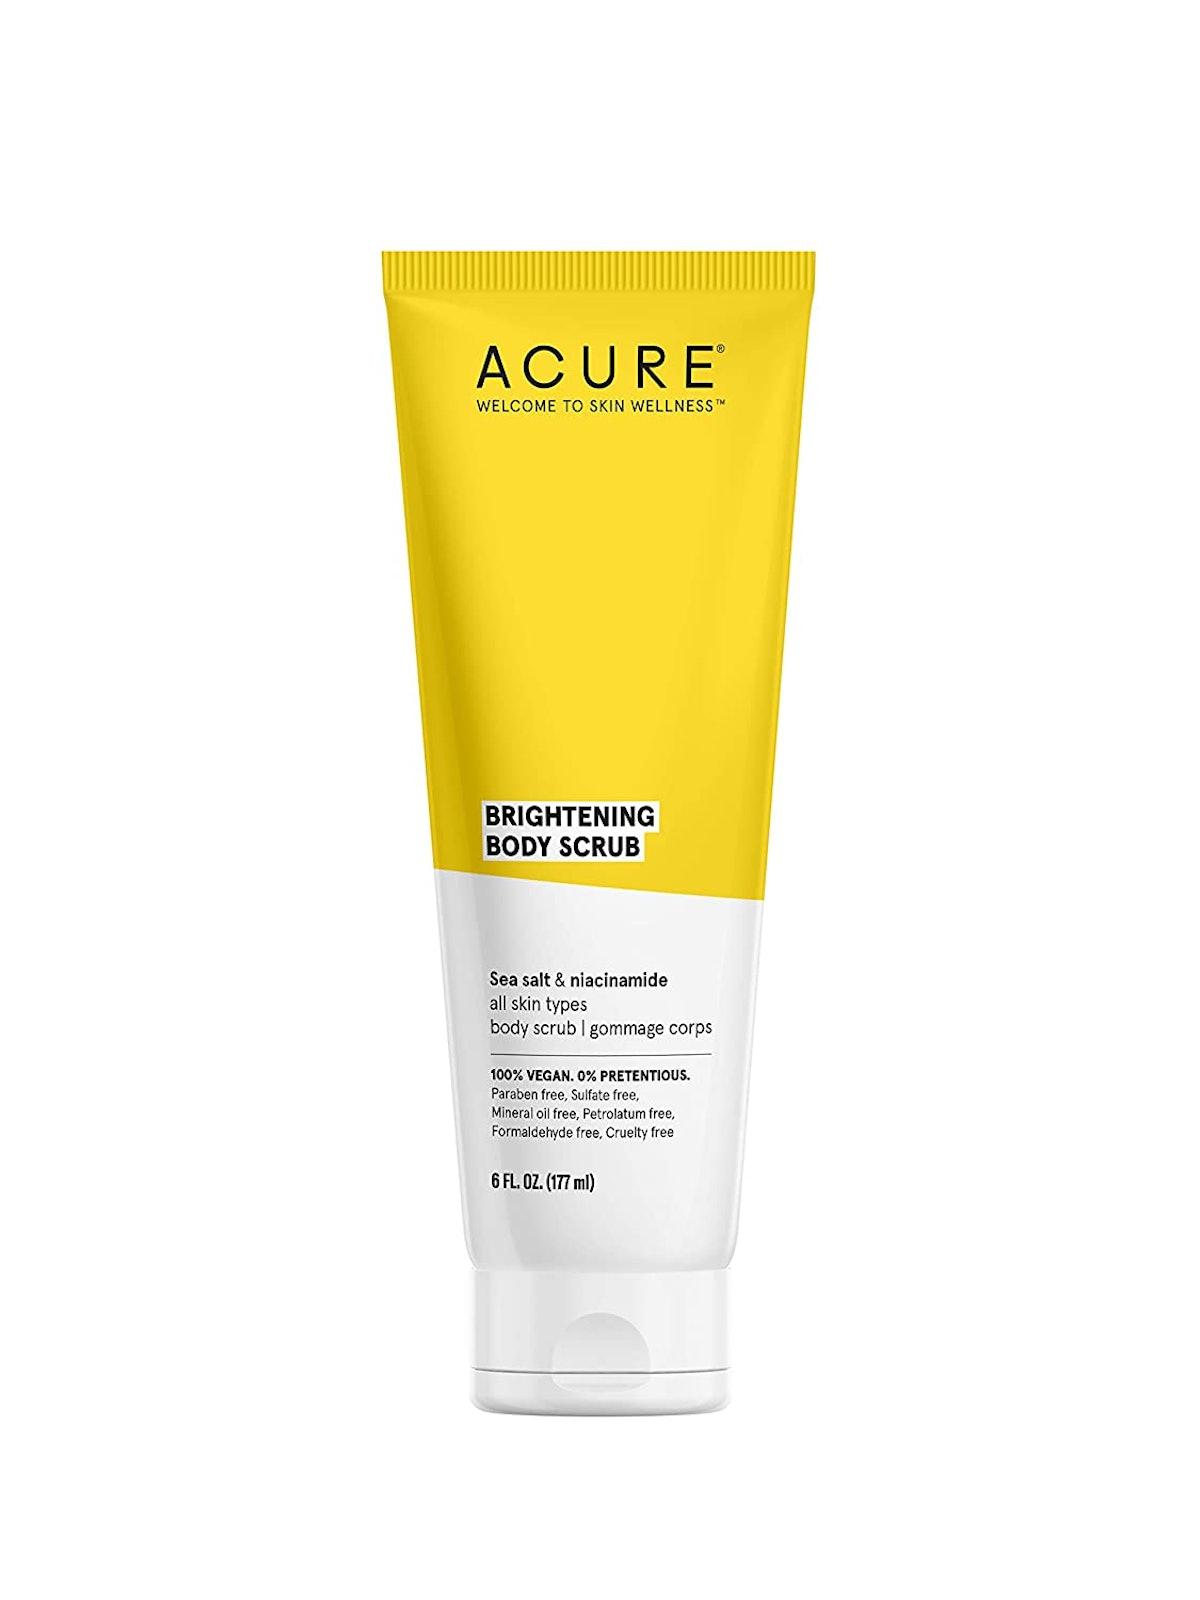 ACURE Brightening Body Scrub